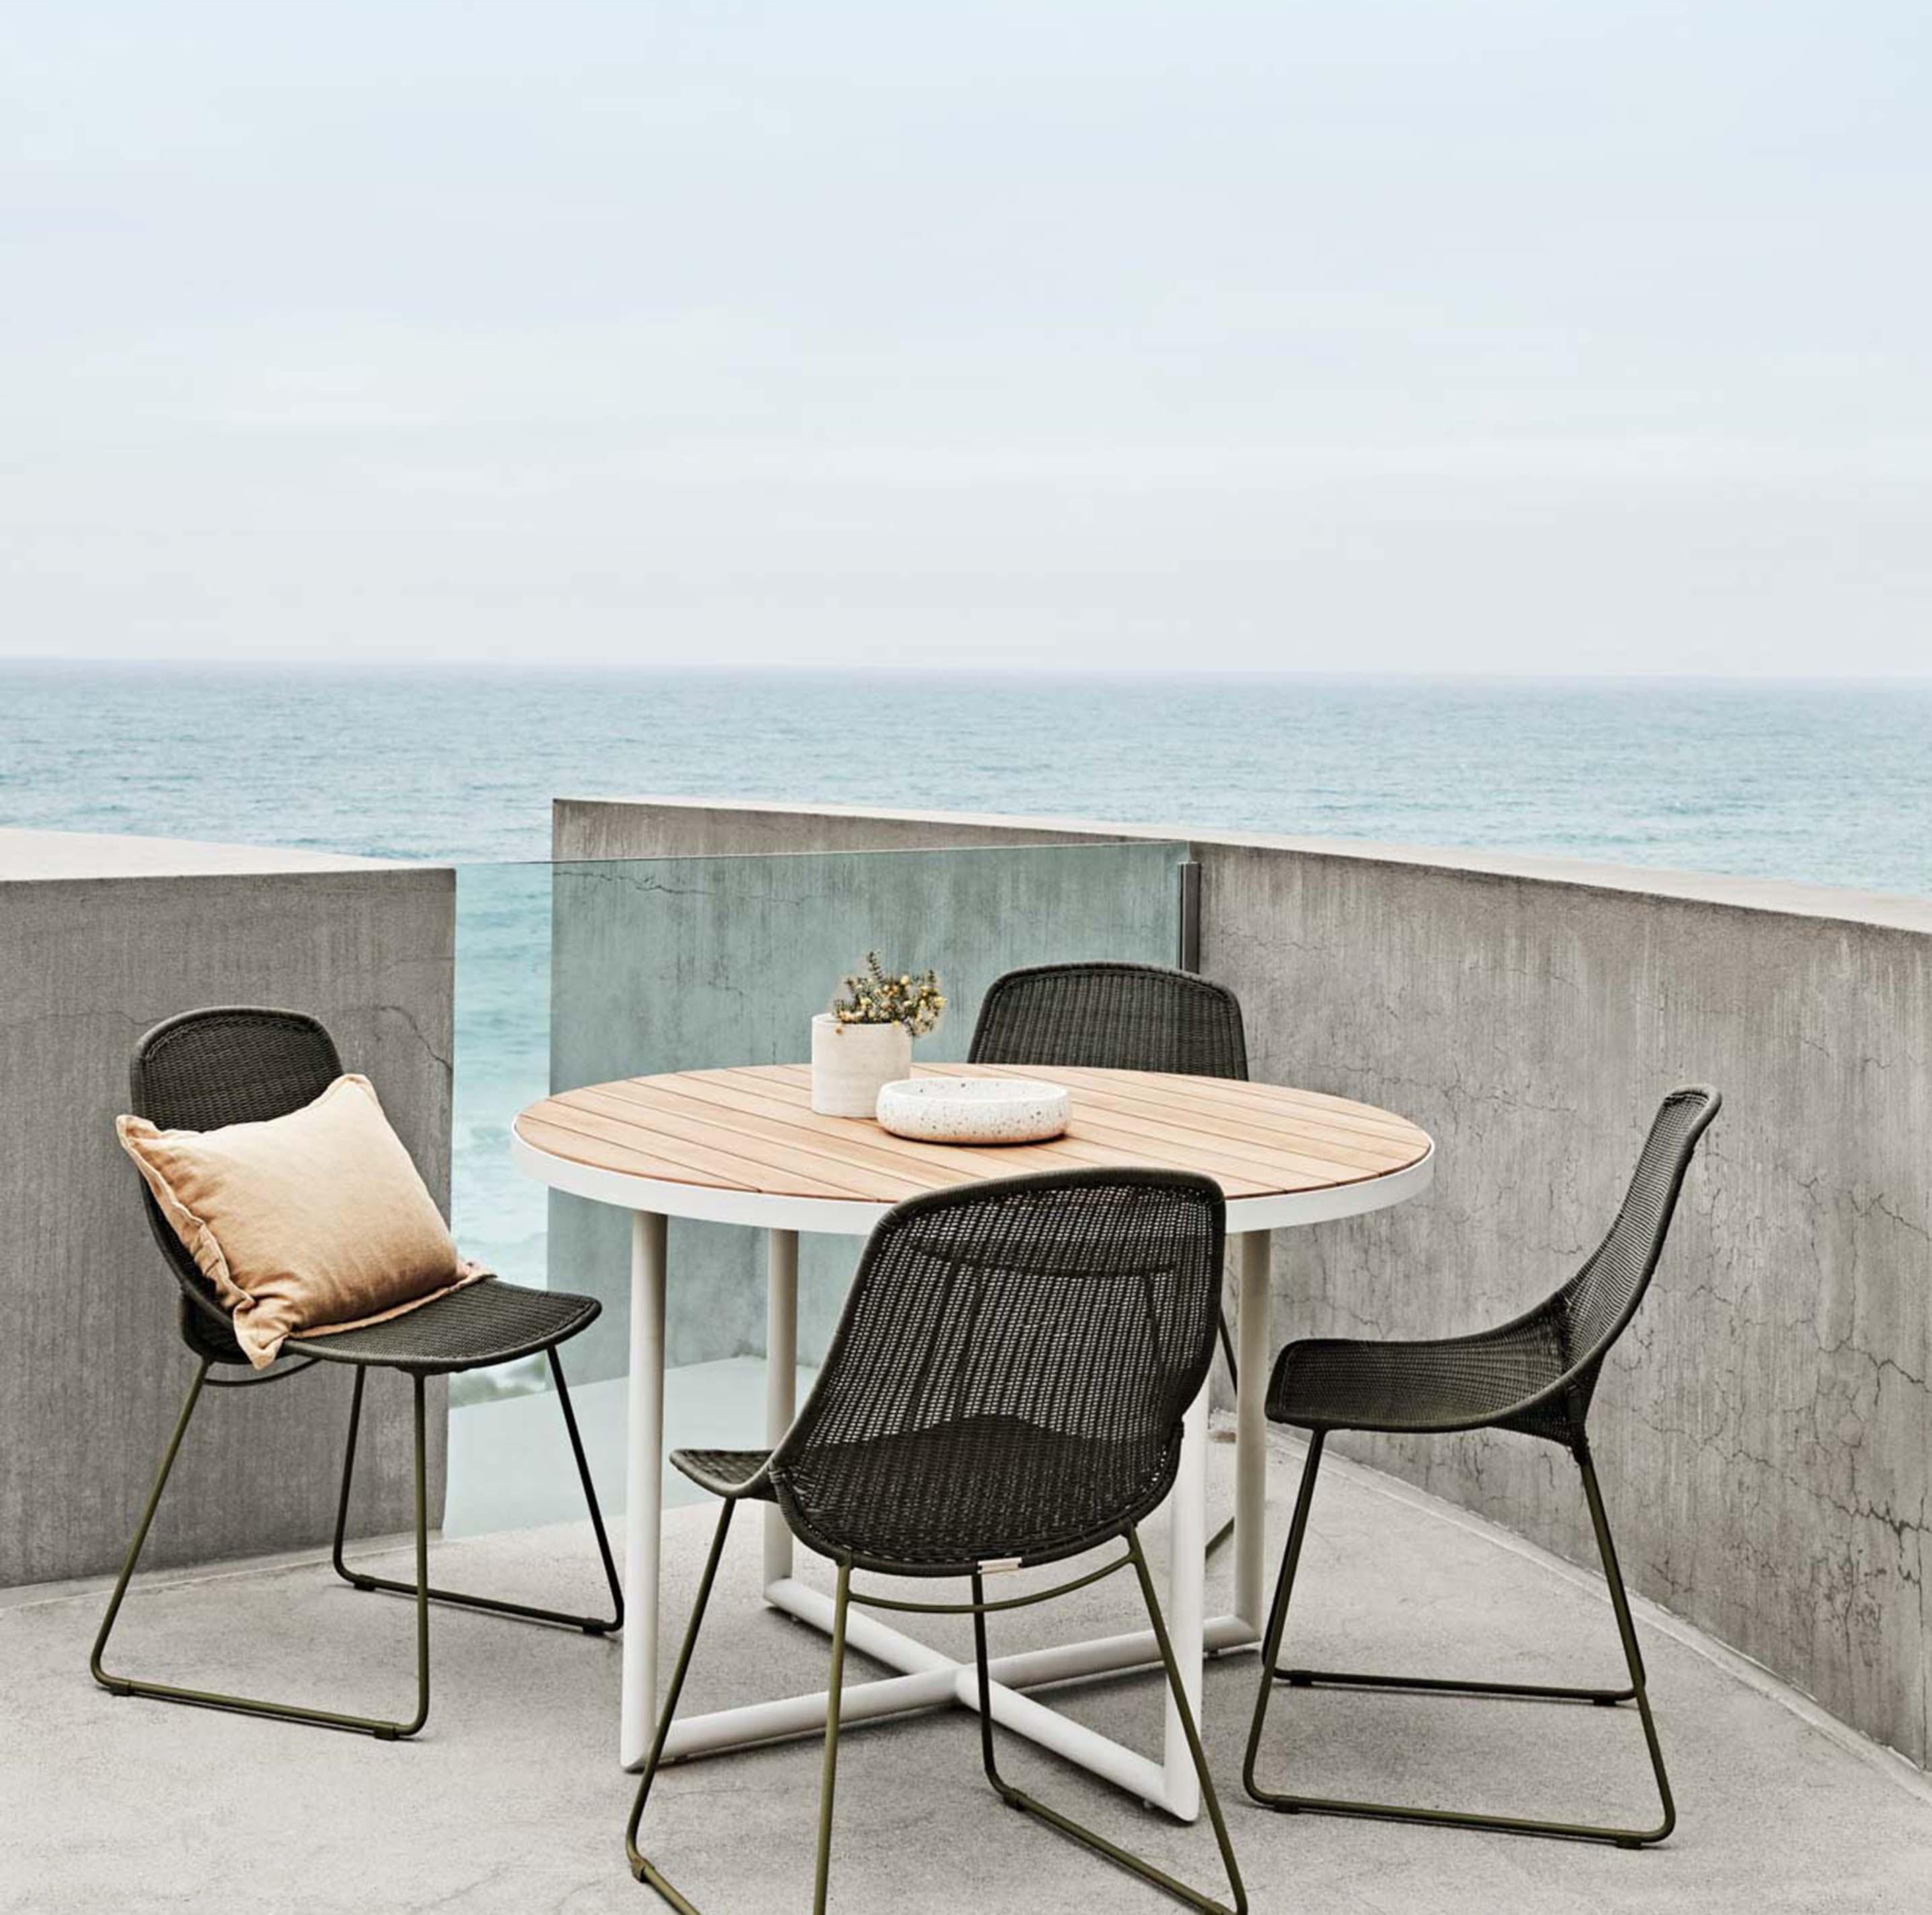 Blog hero-article-images choose-your-outdoor-furniture_hero